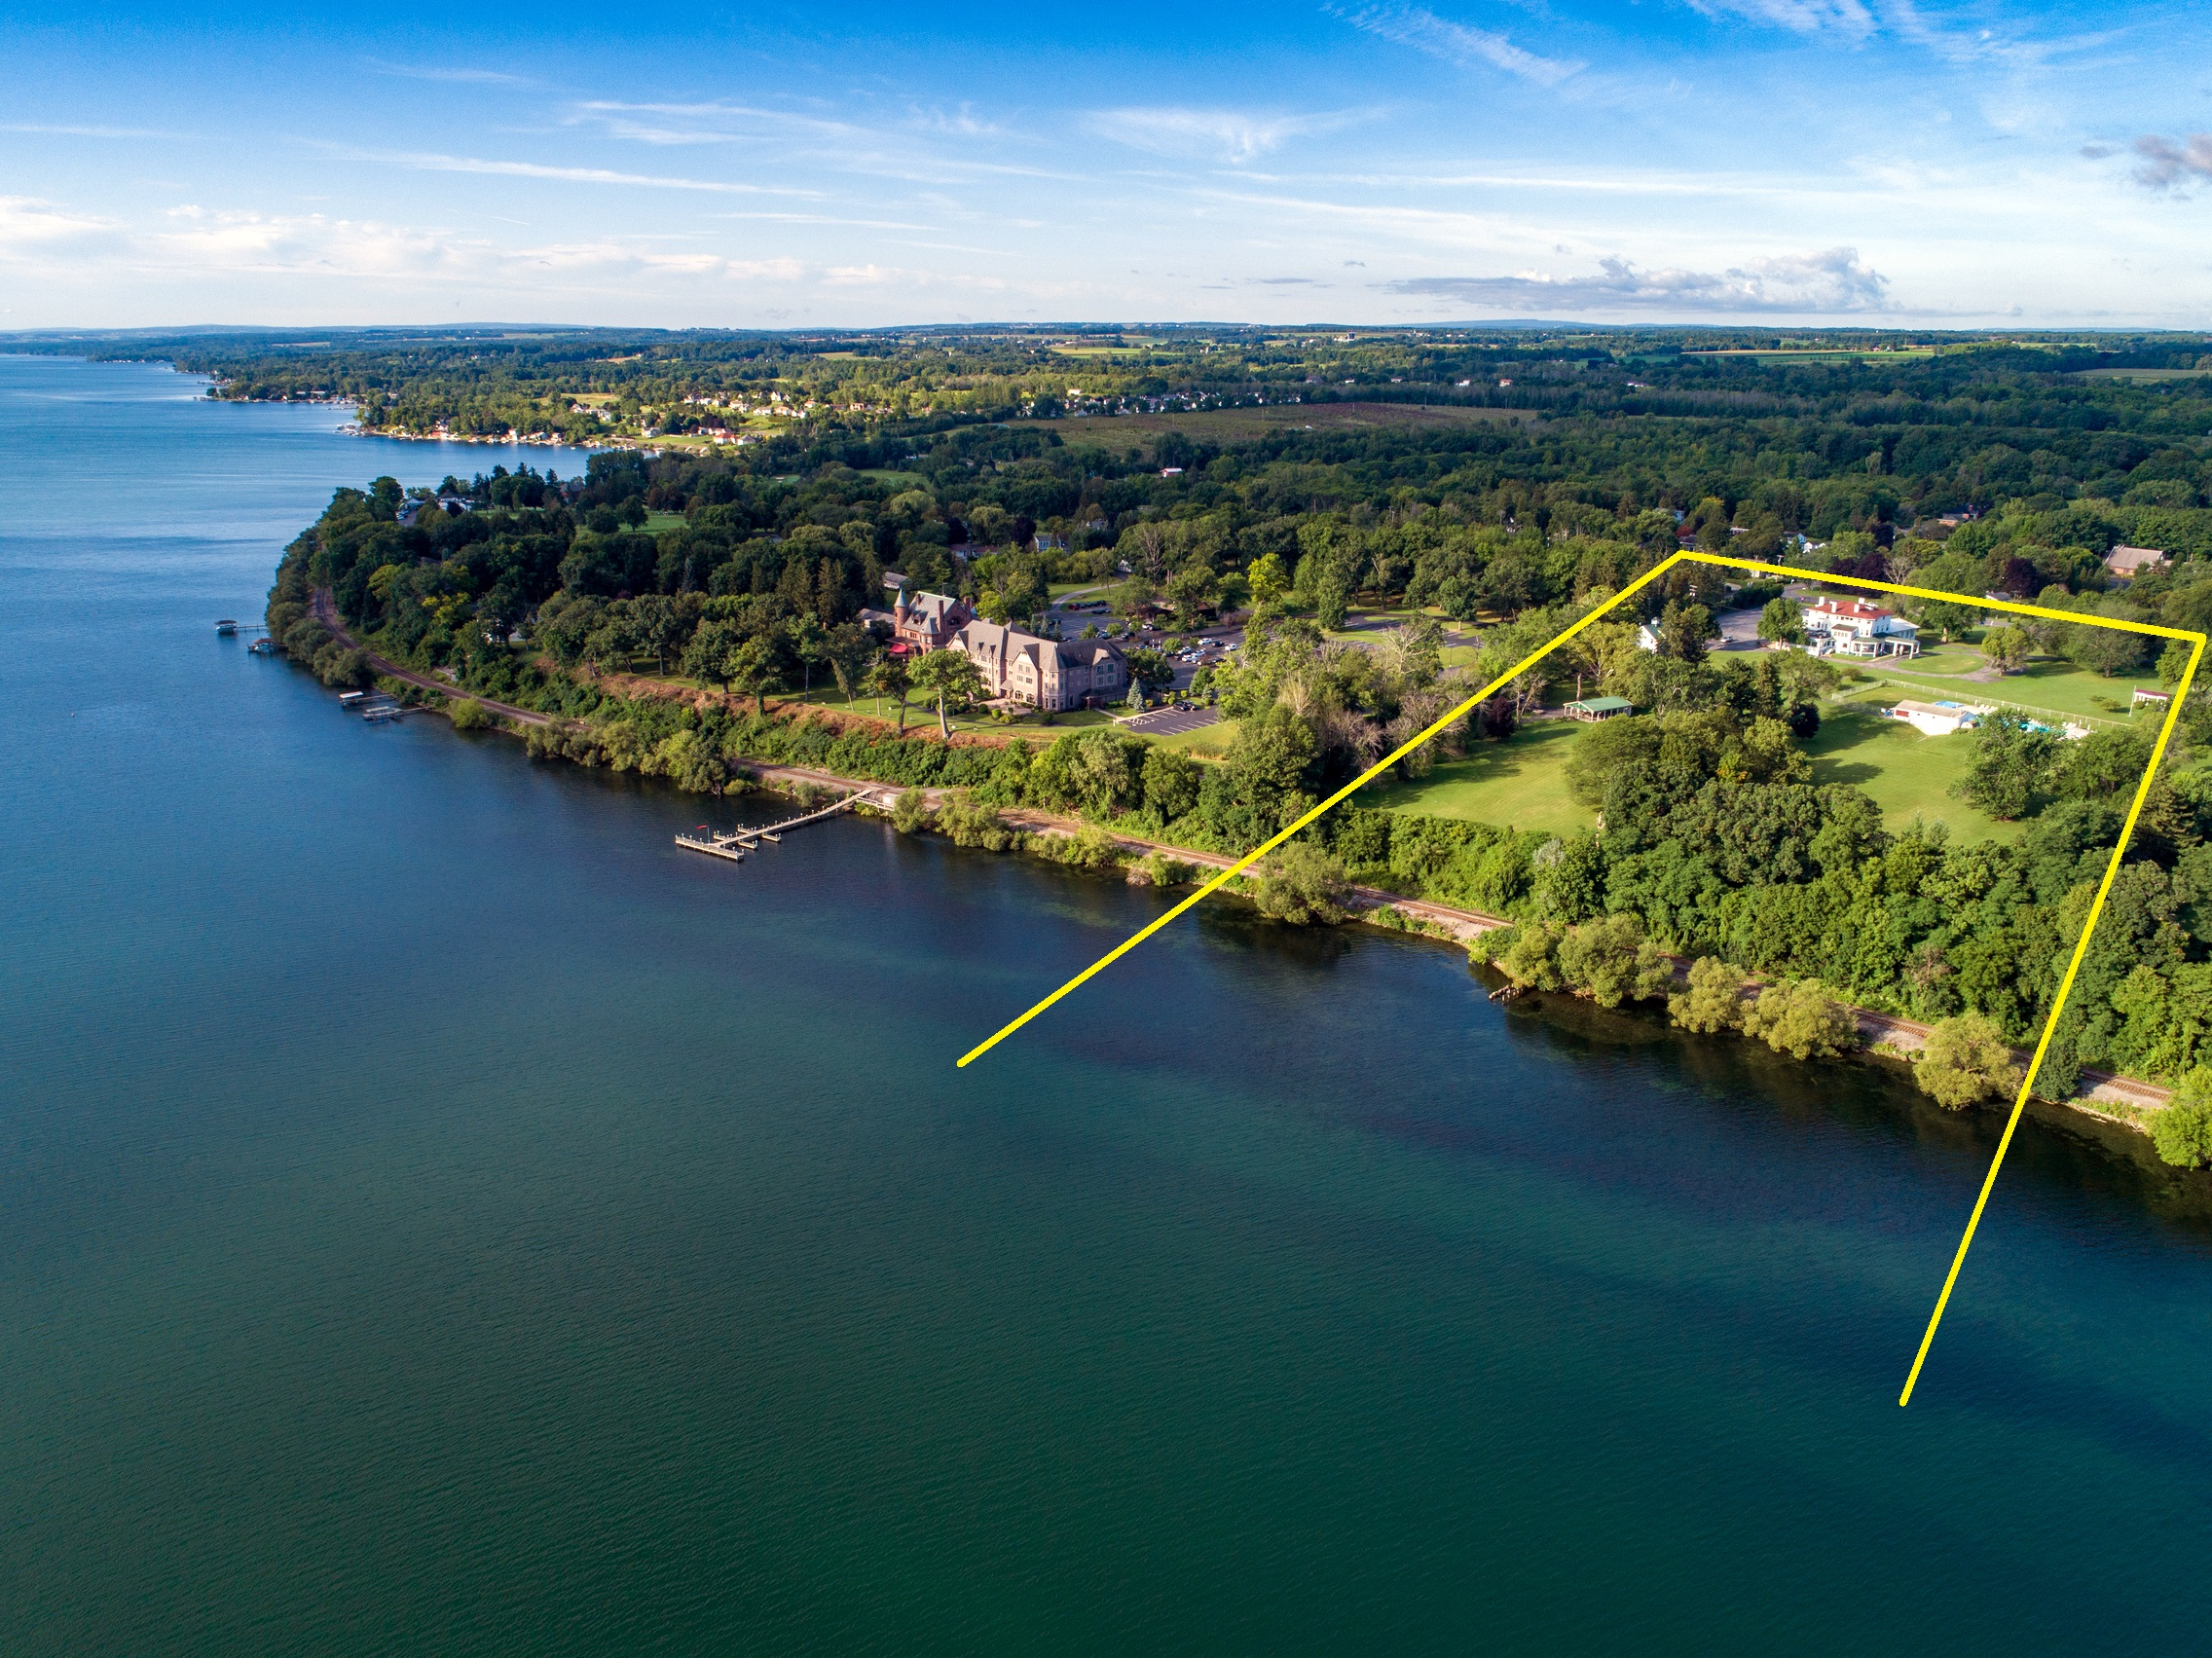 3  Seneca Lake Auction, American Legion, 1115 Lochland Rd, Geneva, NY 14456, Seneca Lake, Finger Lakes Property Listed For Sale by Michael DeRosa, Real Estate Broker, Michael DeRosa Exchange.jpg